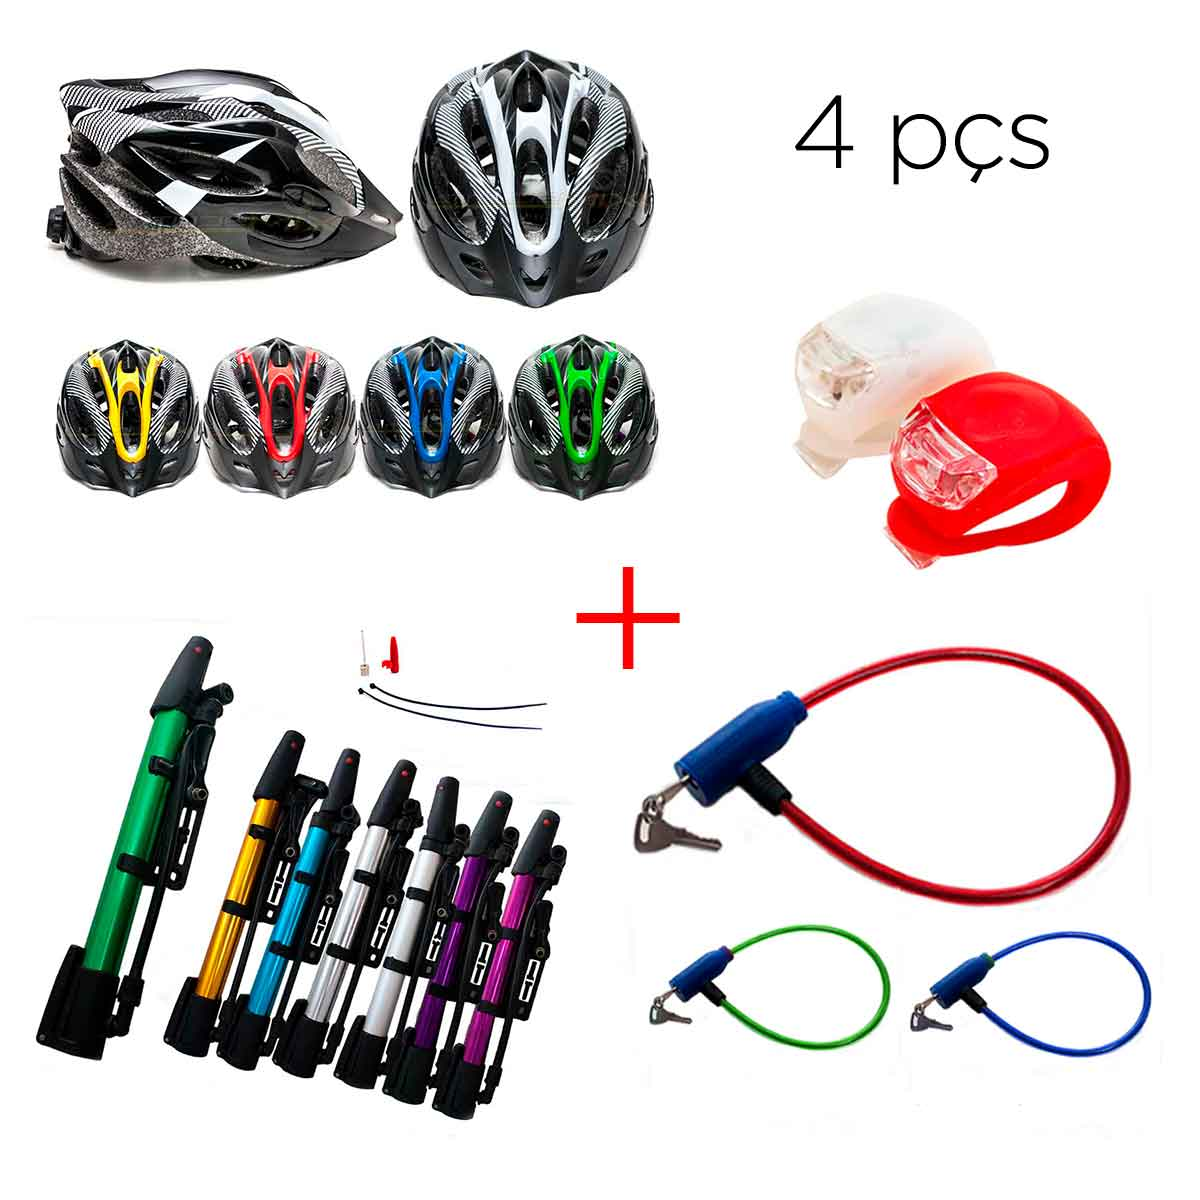 Kit Ciclismo Capacete Ciclista Bike+farol+cadeado+bomba